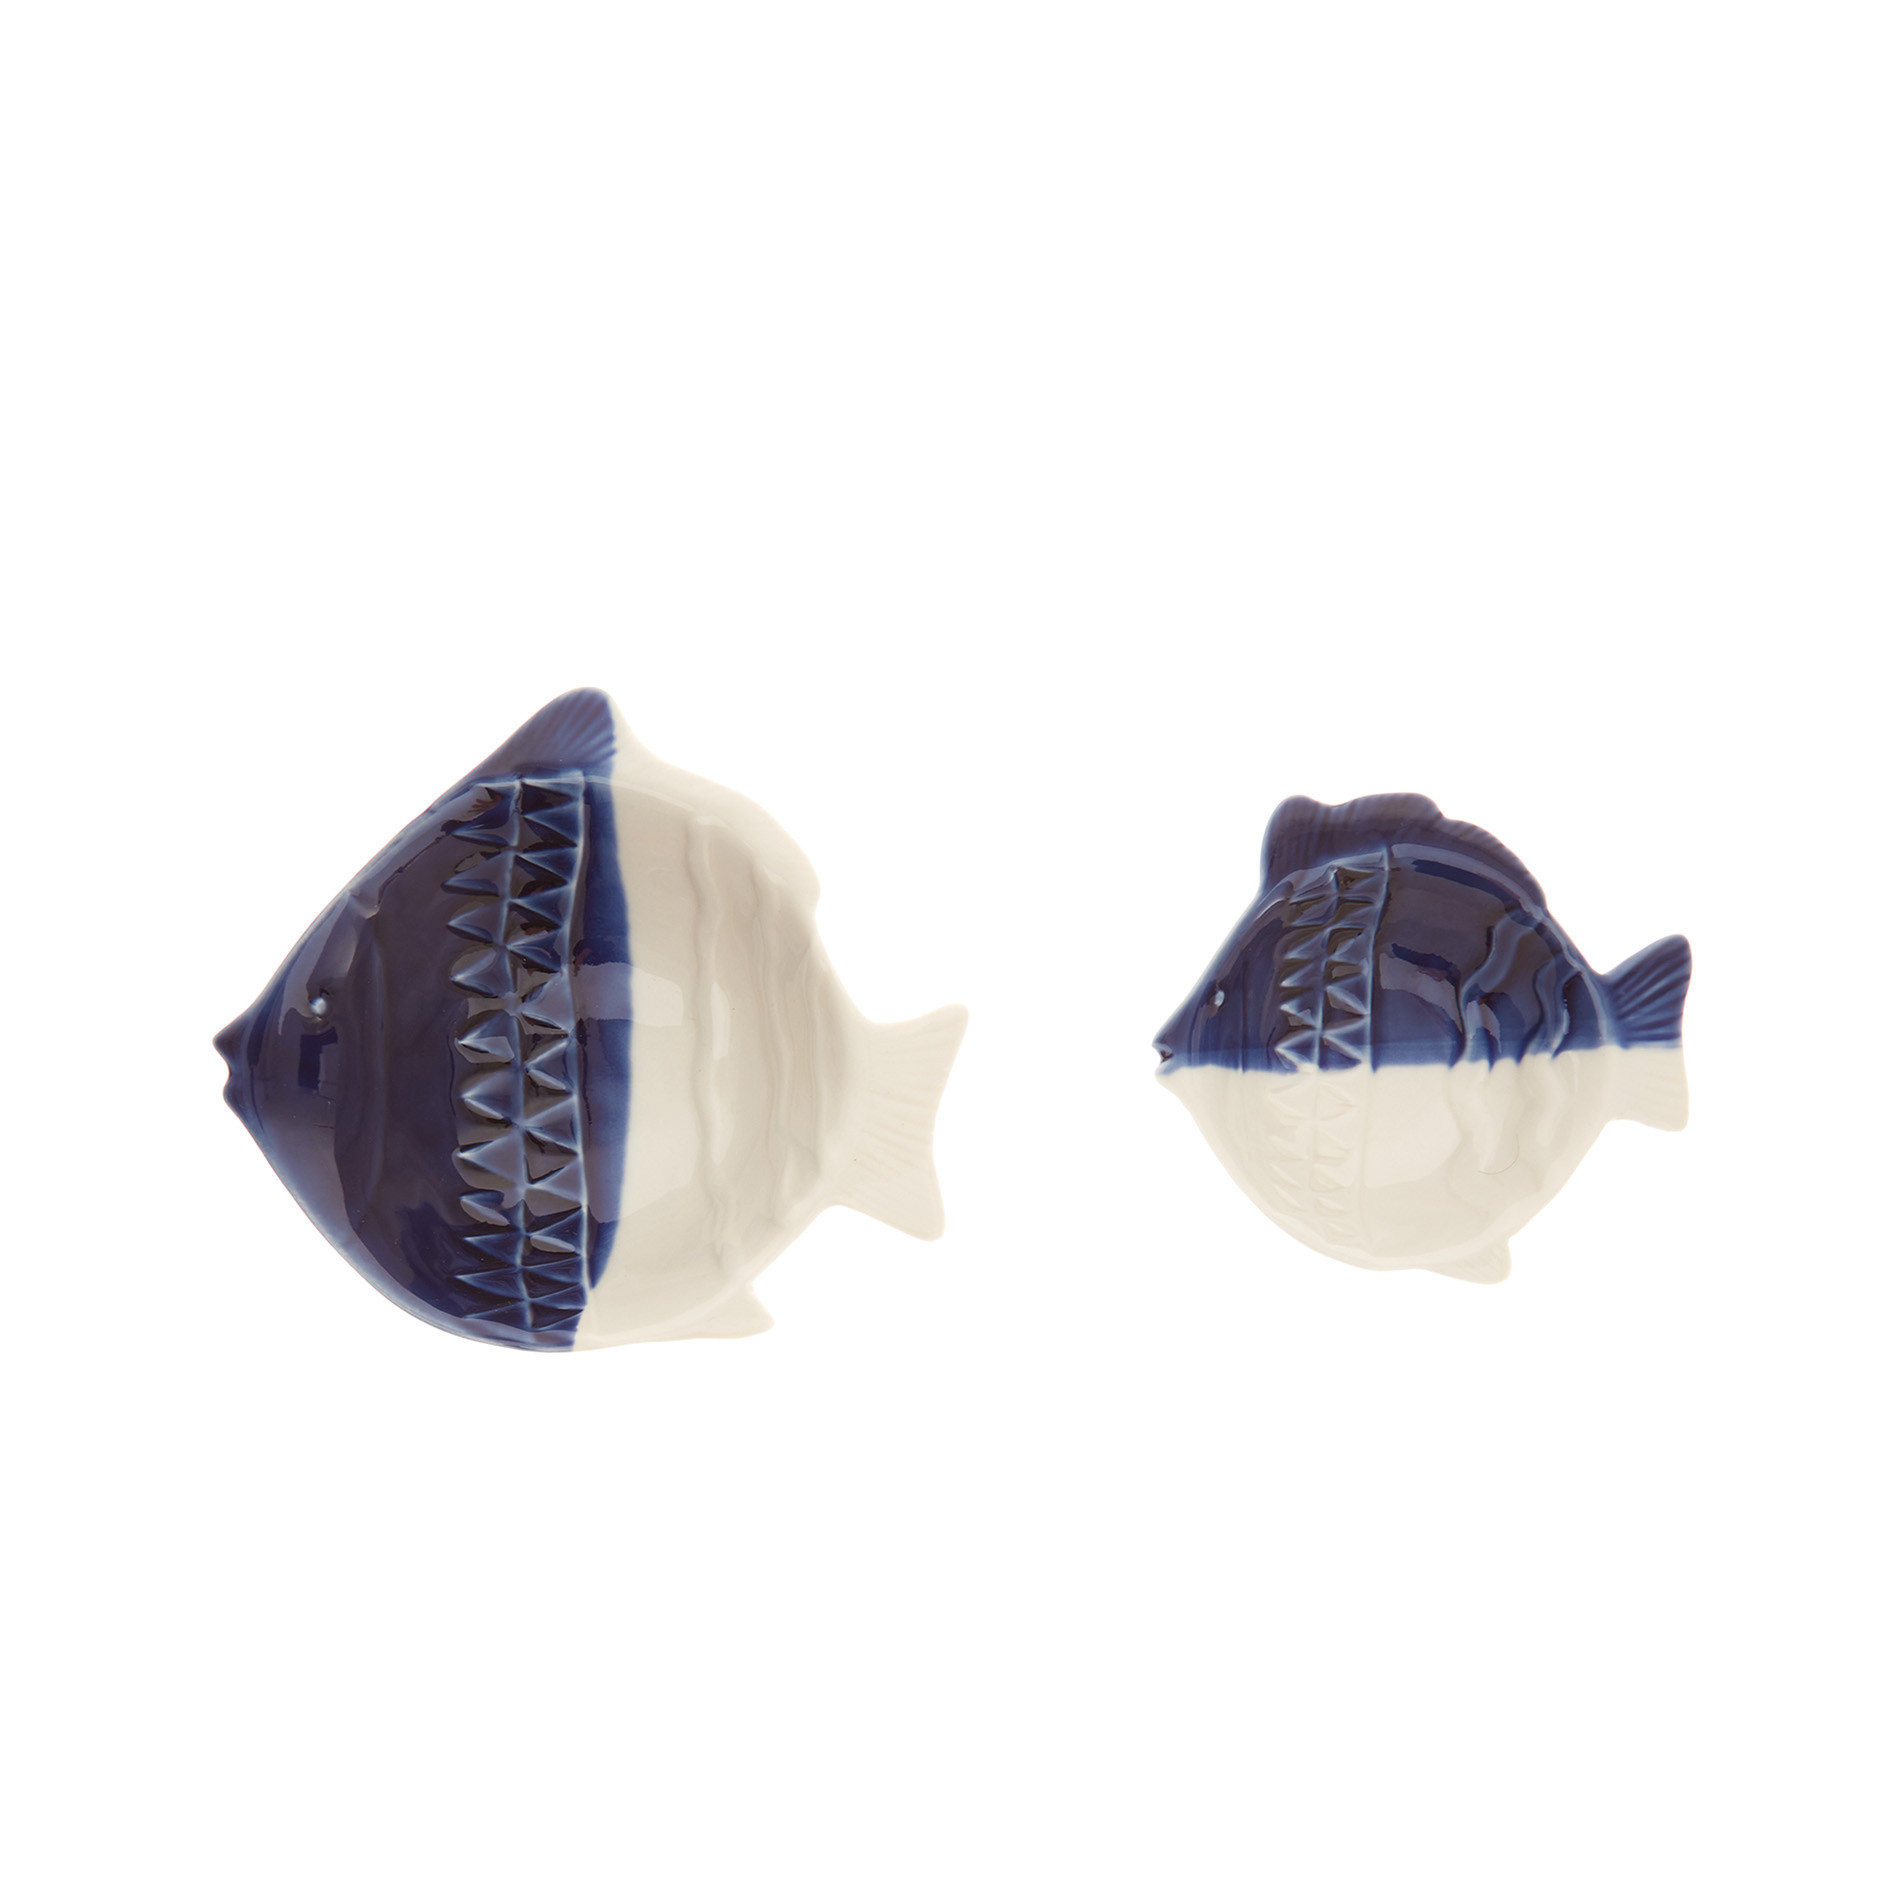 Coppetta porcellana a pesce, Bianco/Blu, large image number 1